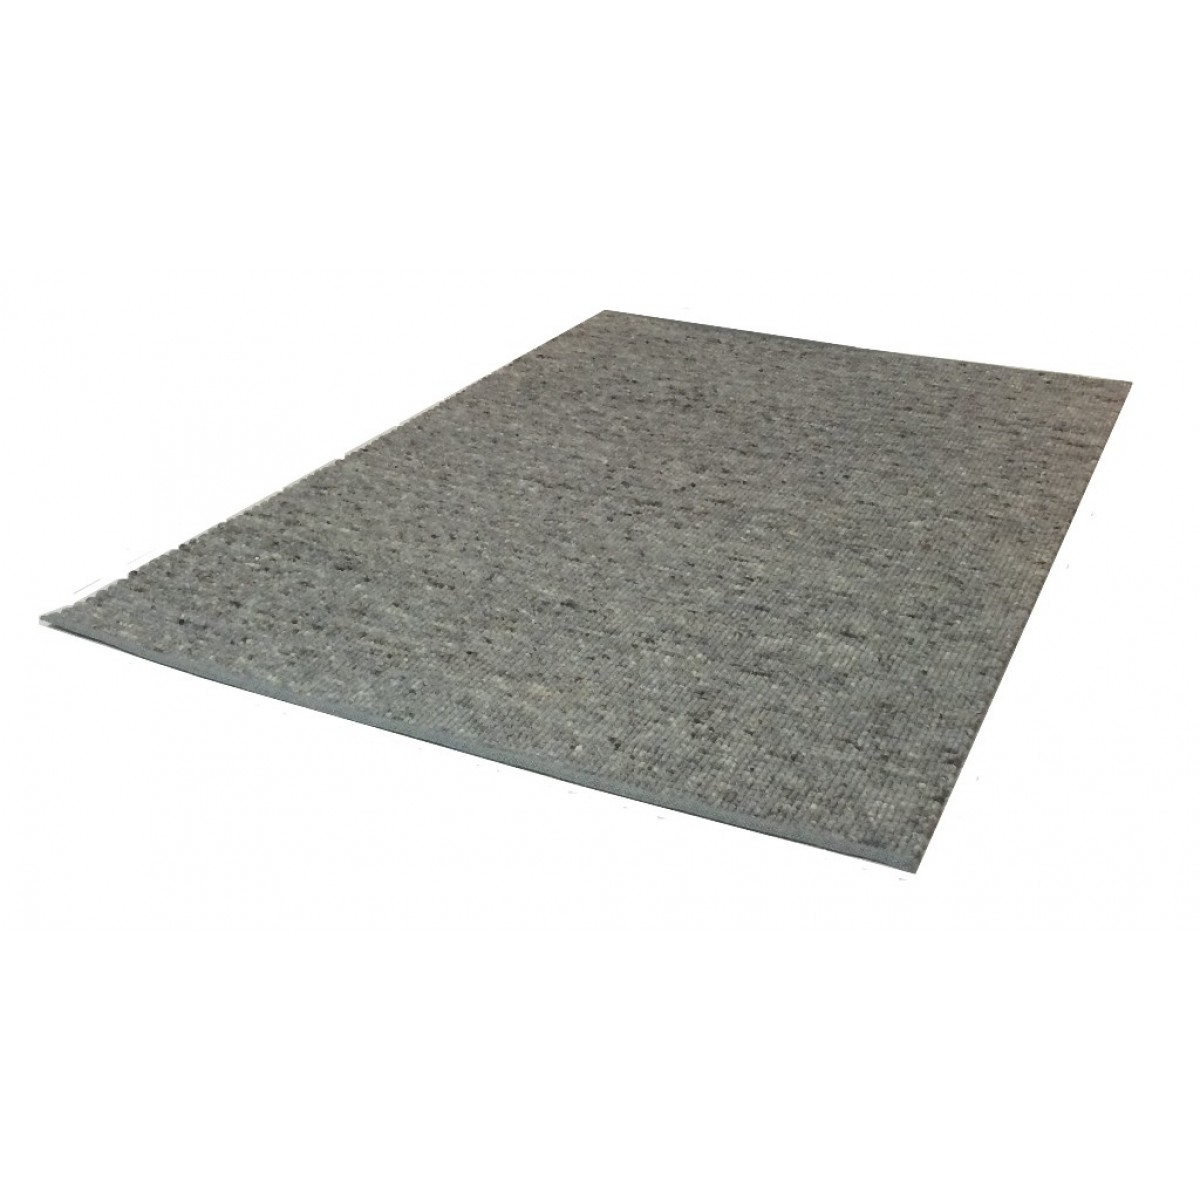 greenland_point_stone_228_vloerkleed_karpet